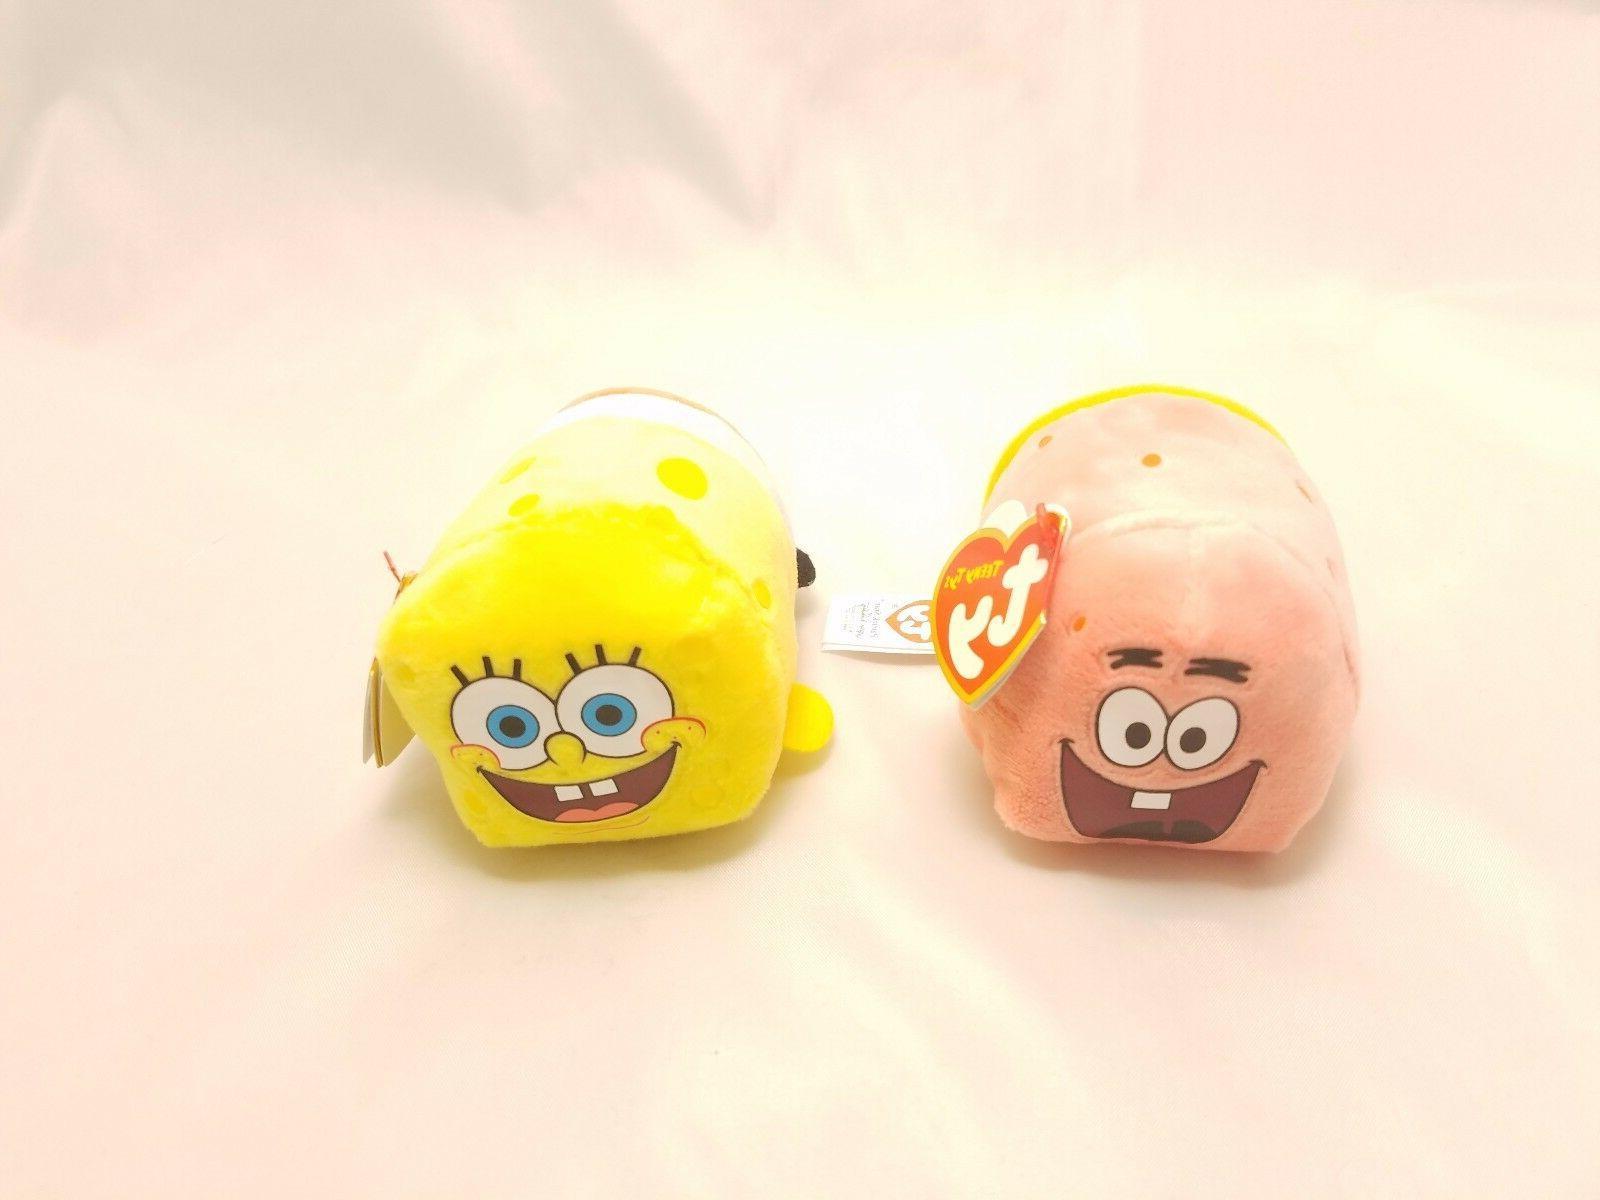 set of 2 spongebob and patrick teeny